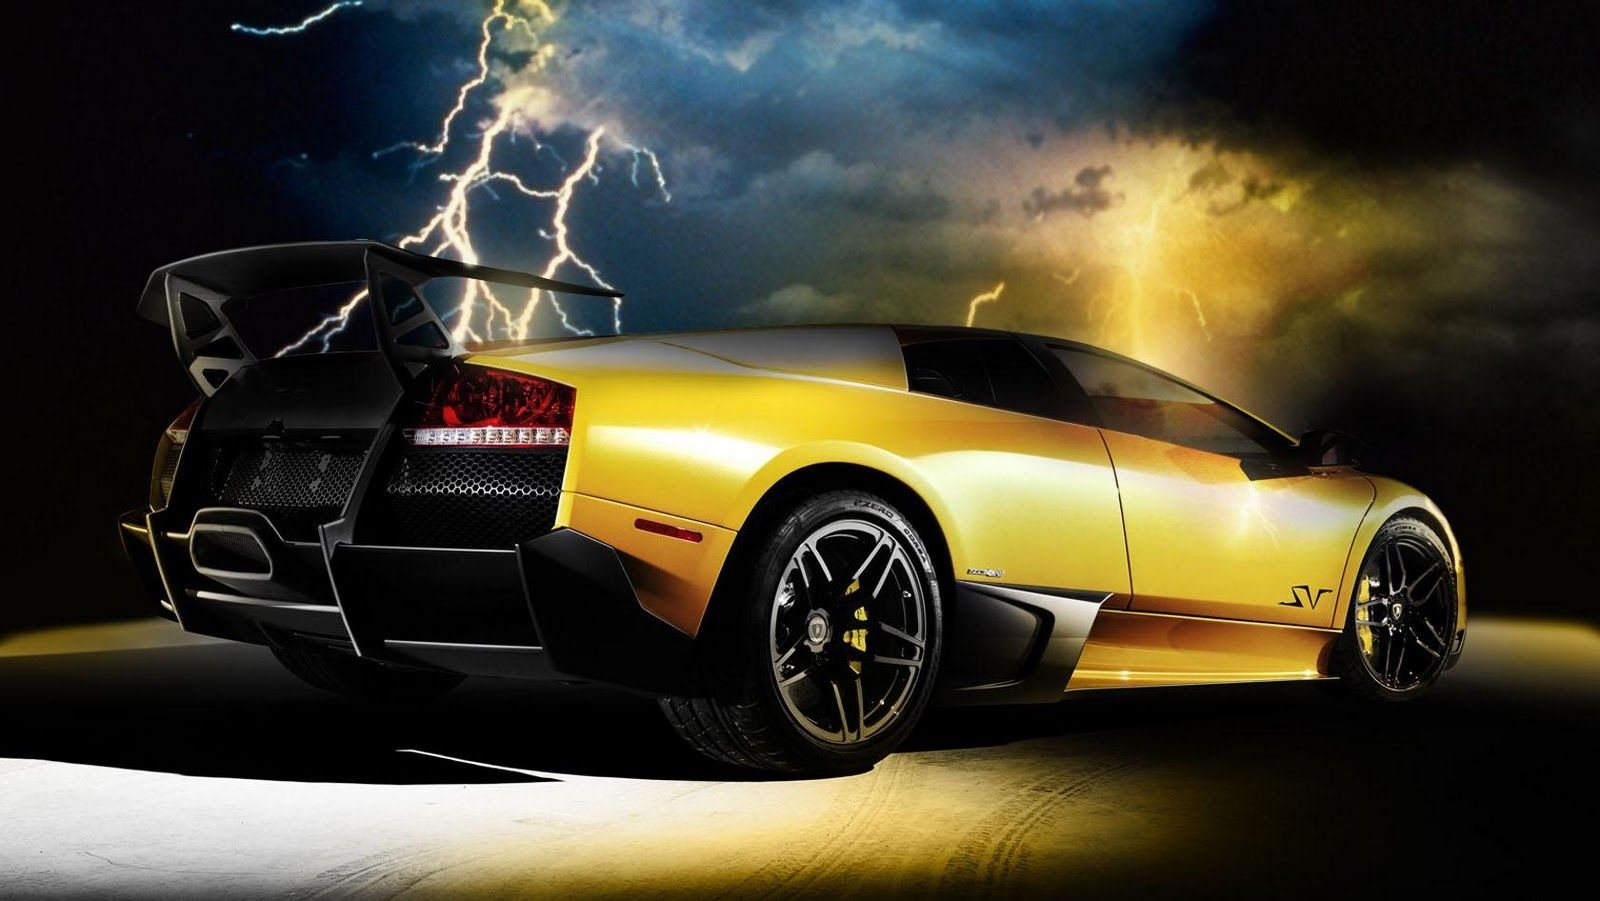 Cool Gold Wallpaper Cool Lamborghini Wallpaper In 2020 Hd Wallpapers Of Cars Cool Wallpapers Cars Lamborghini Wallpaper Iphone